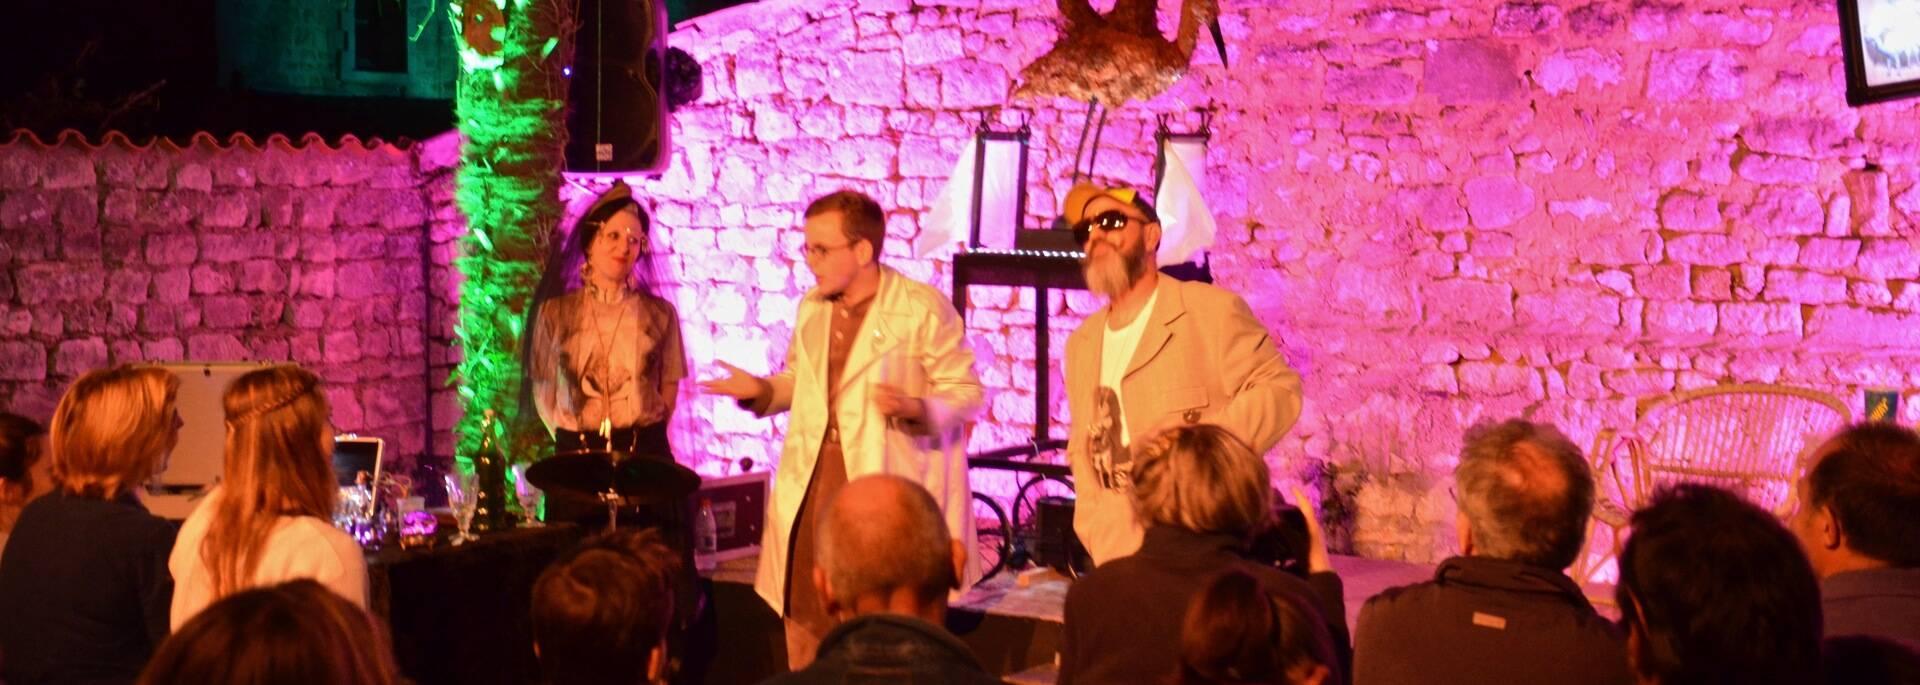 Musical and theatrical show during Cigogne en Fête  - © Samuel Courtois